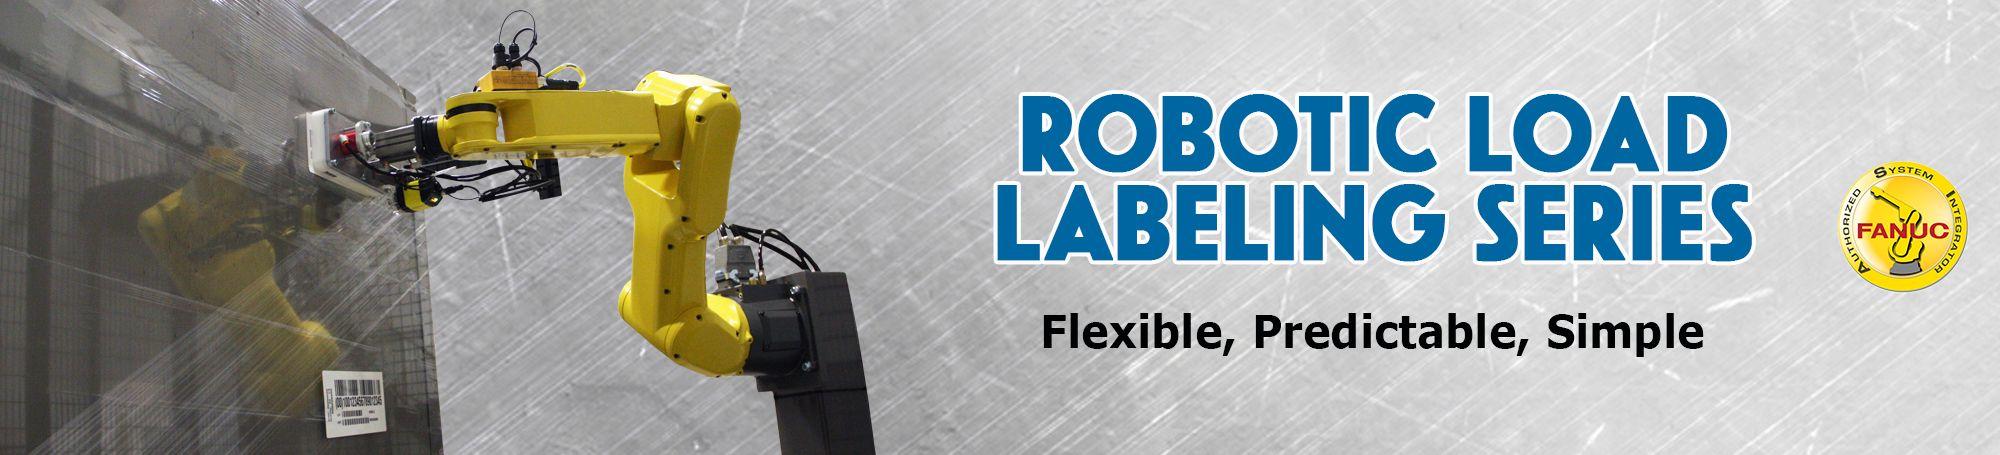 Robotic Load Labeler 20-1.jpg